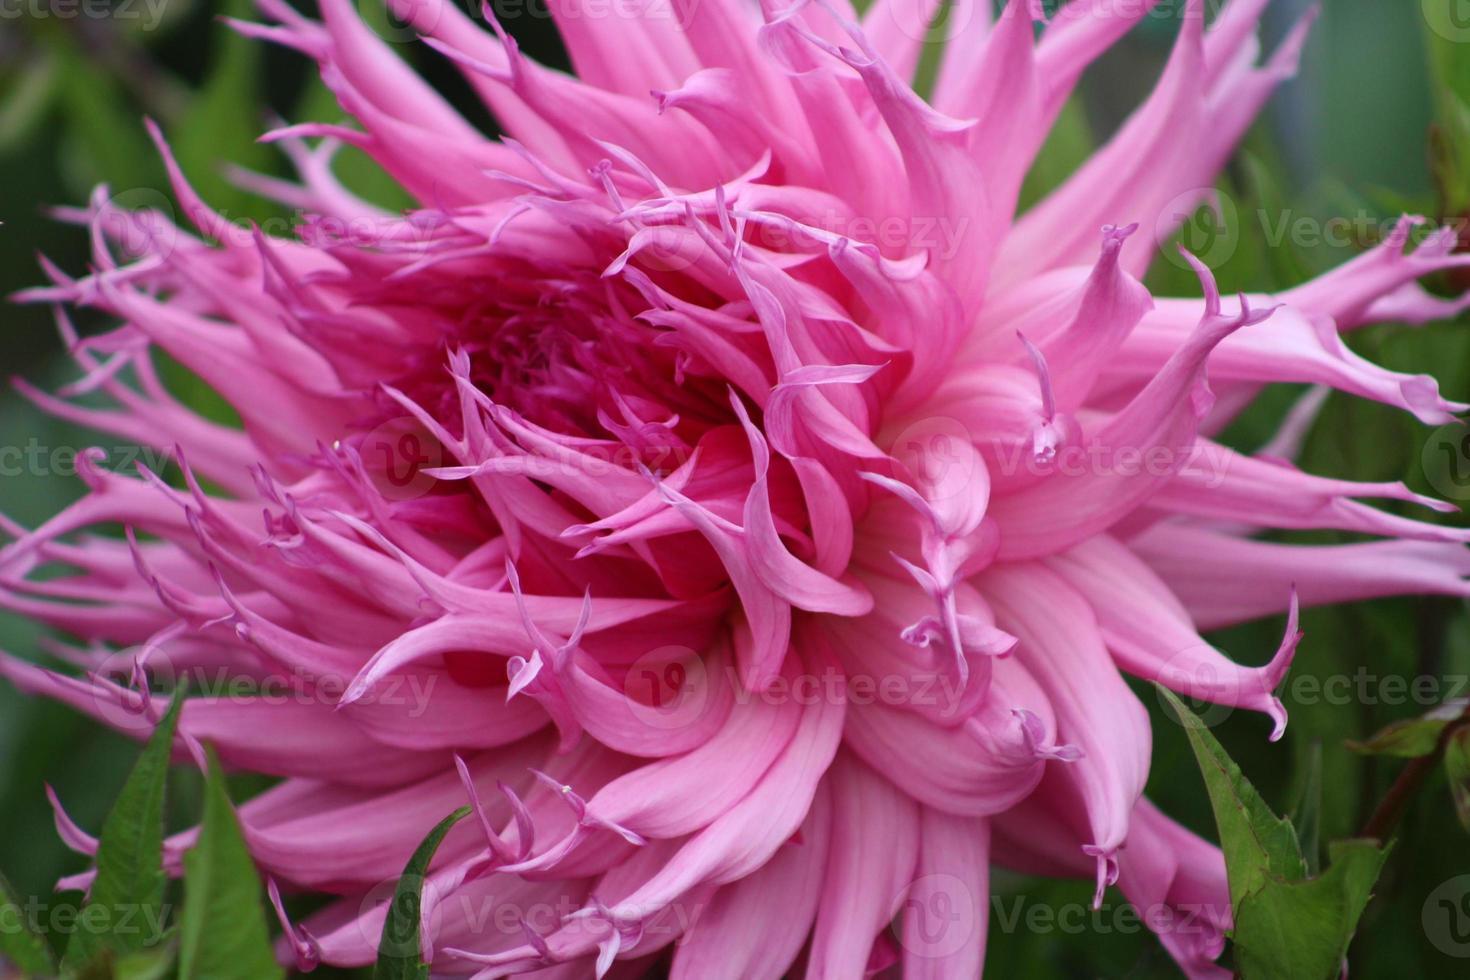 roze bloem close-up foto